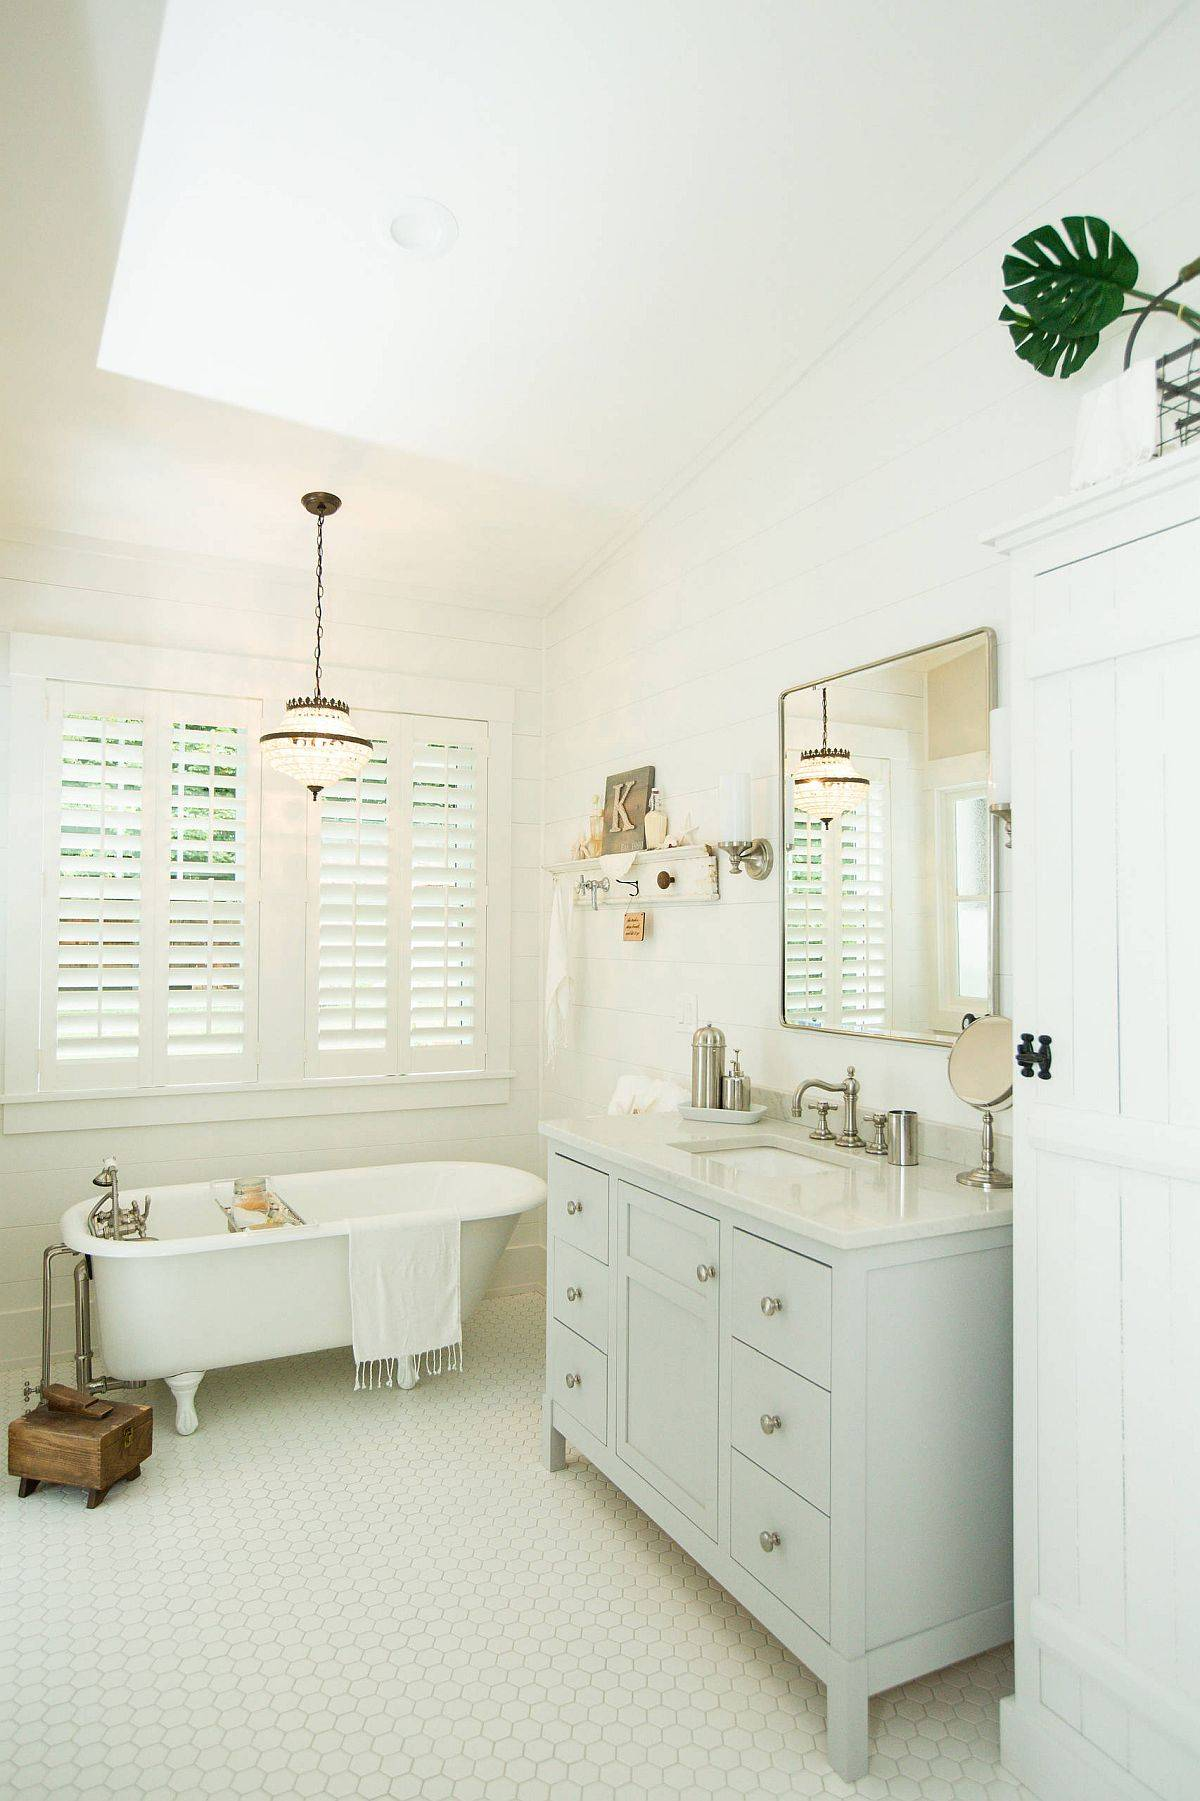 Small-all-white-bathroom-leans-more-toards-modern-than-farmhouse-79428